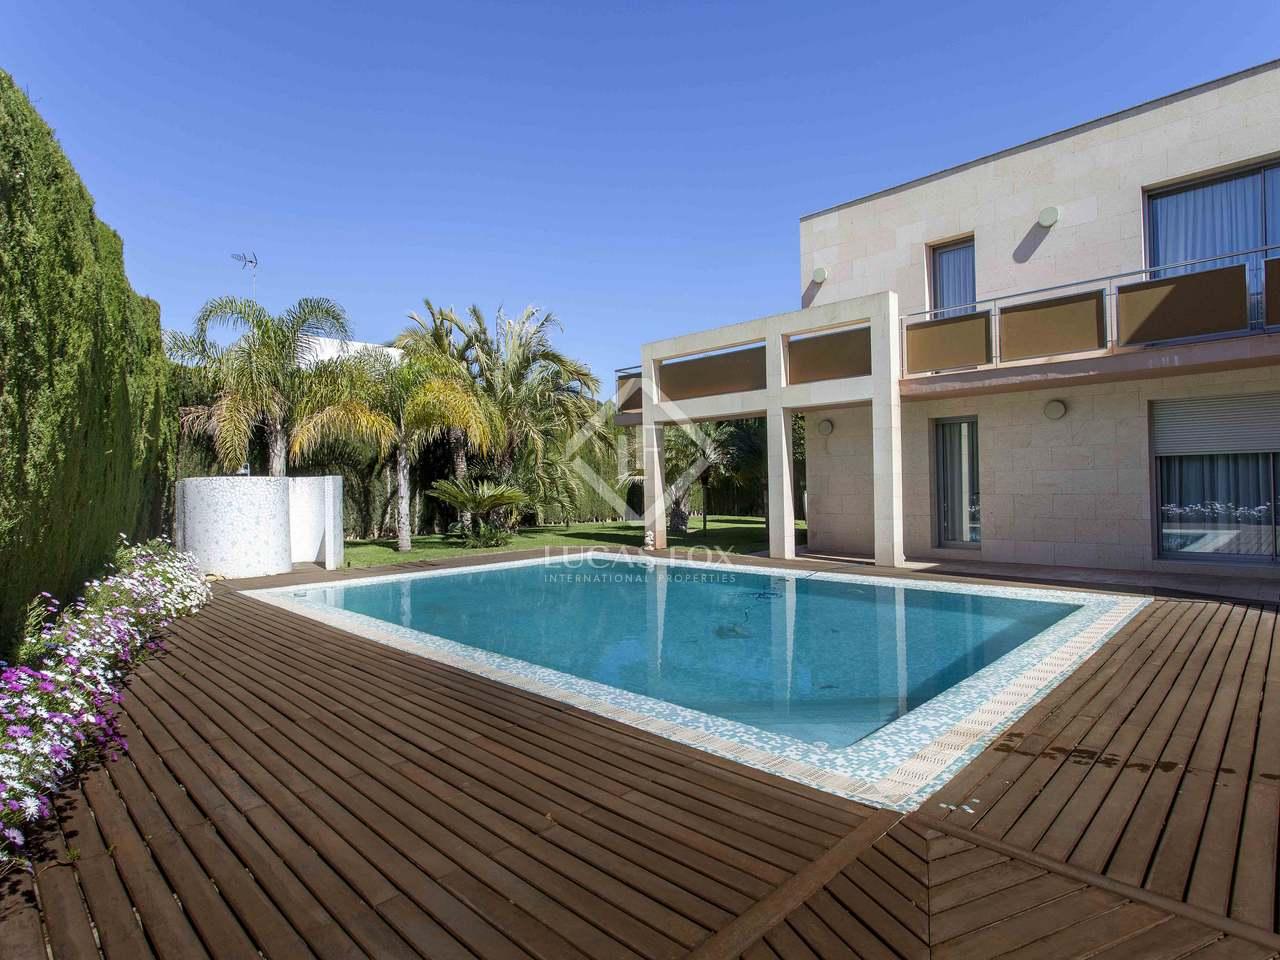 Chalet moderno con piscina en alquiler en campolivar godella for Alquiler chalet con piscina